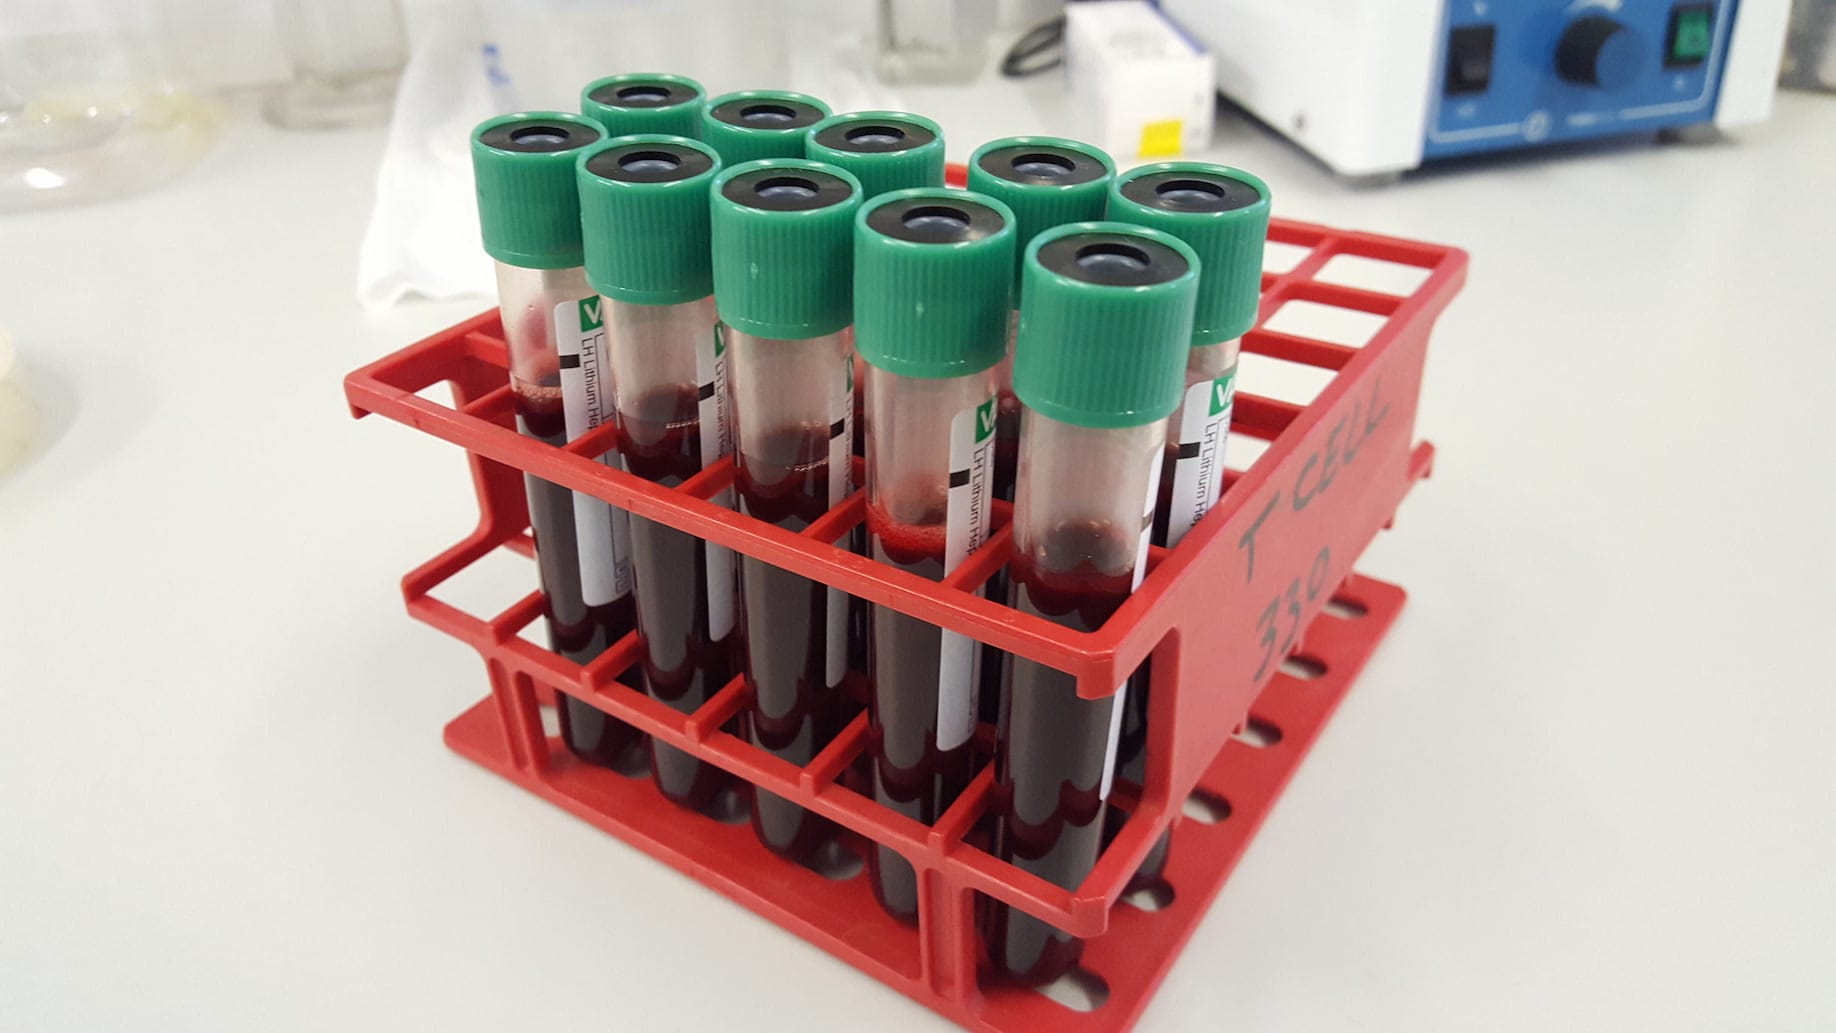 immunology - blood samples - Maria Sharif